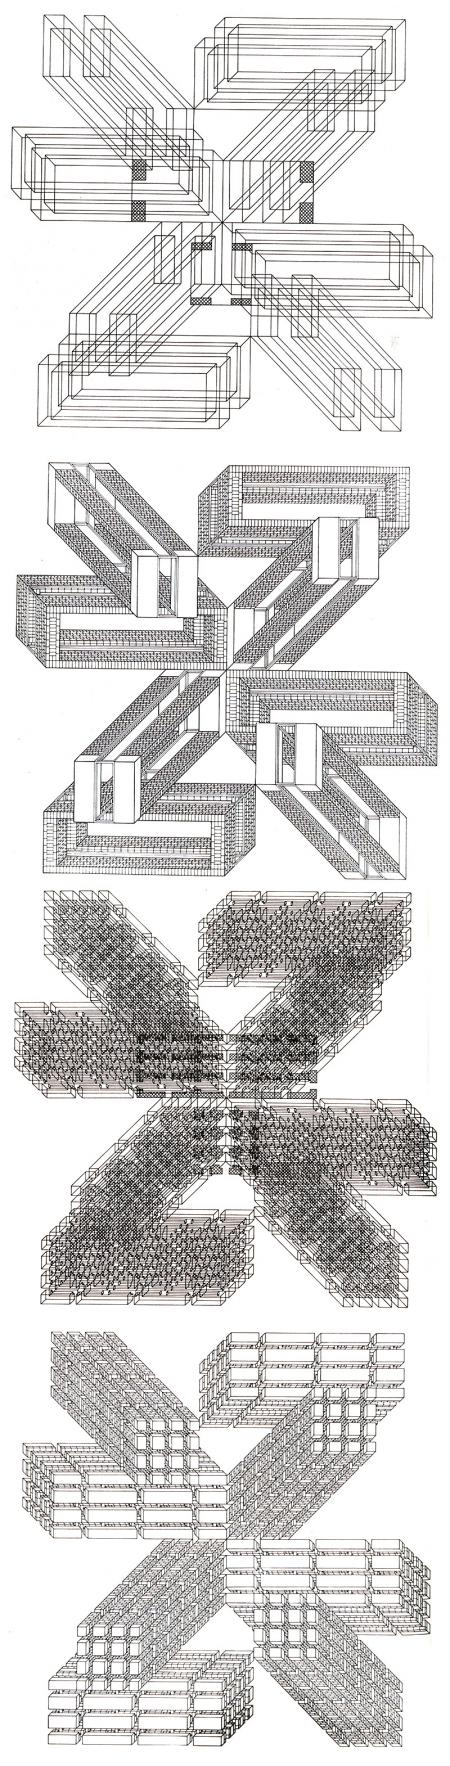 Stanley Tigerman and GL Crabtree. A+U 55 July 1975, 2